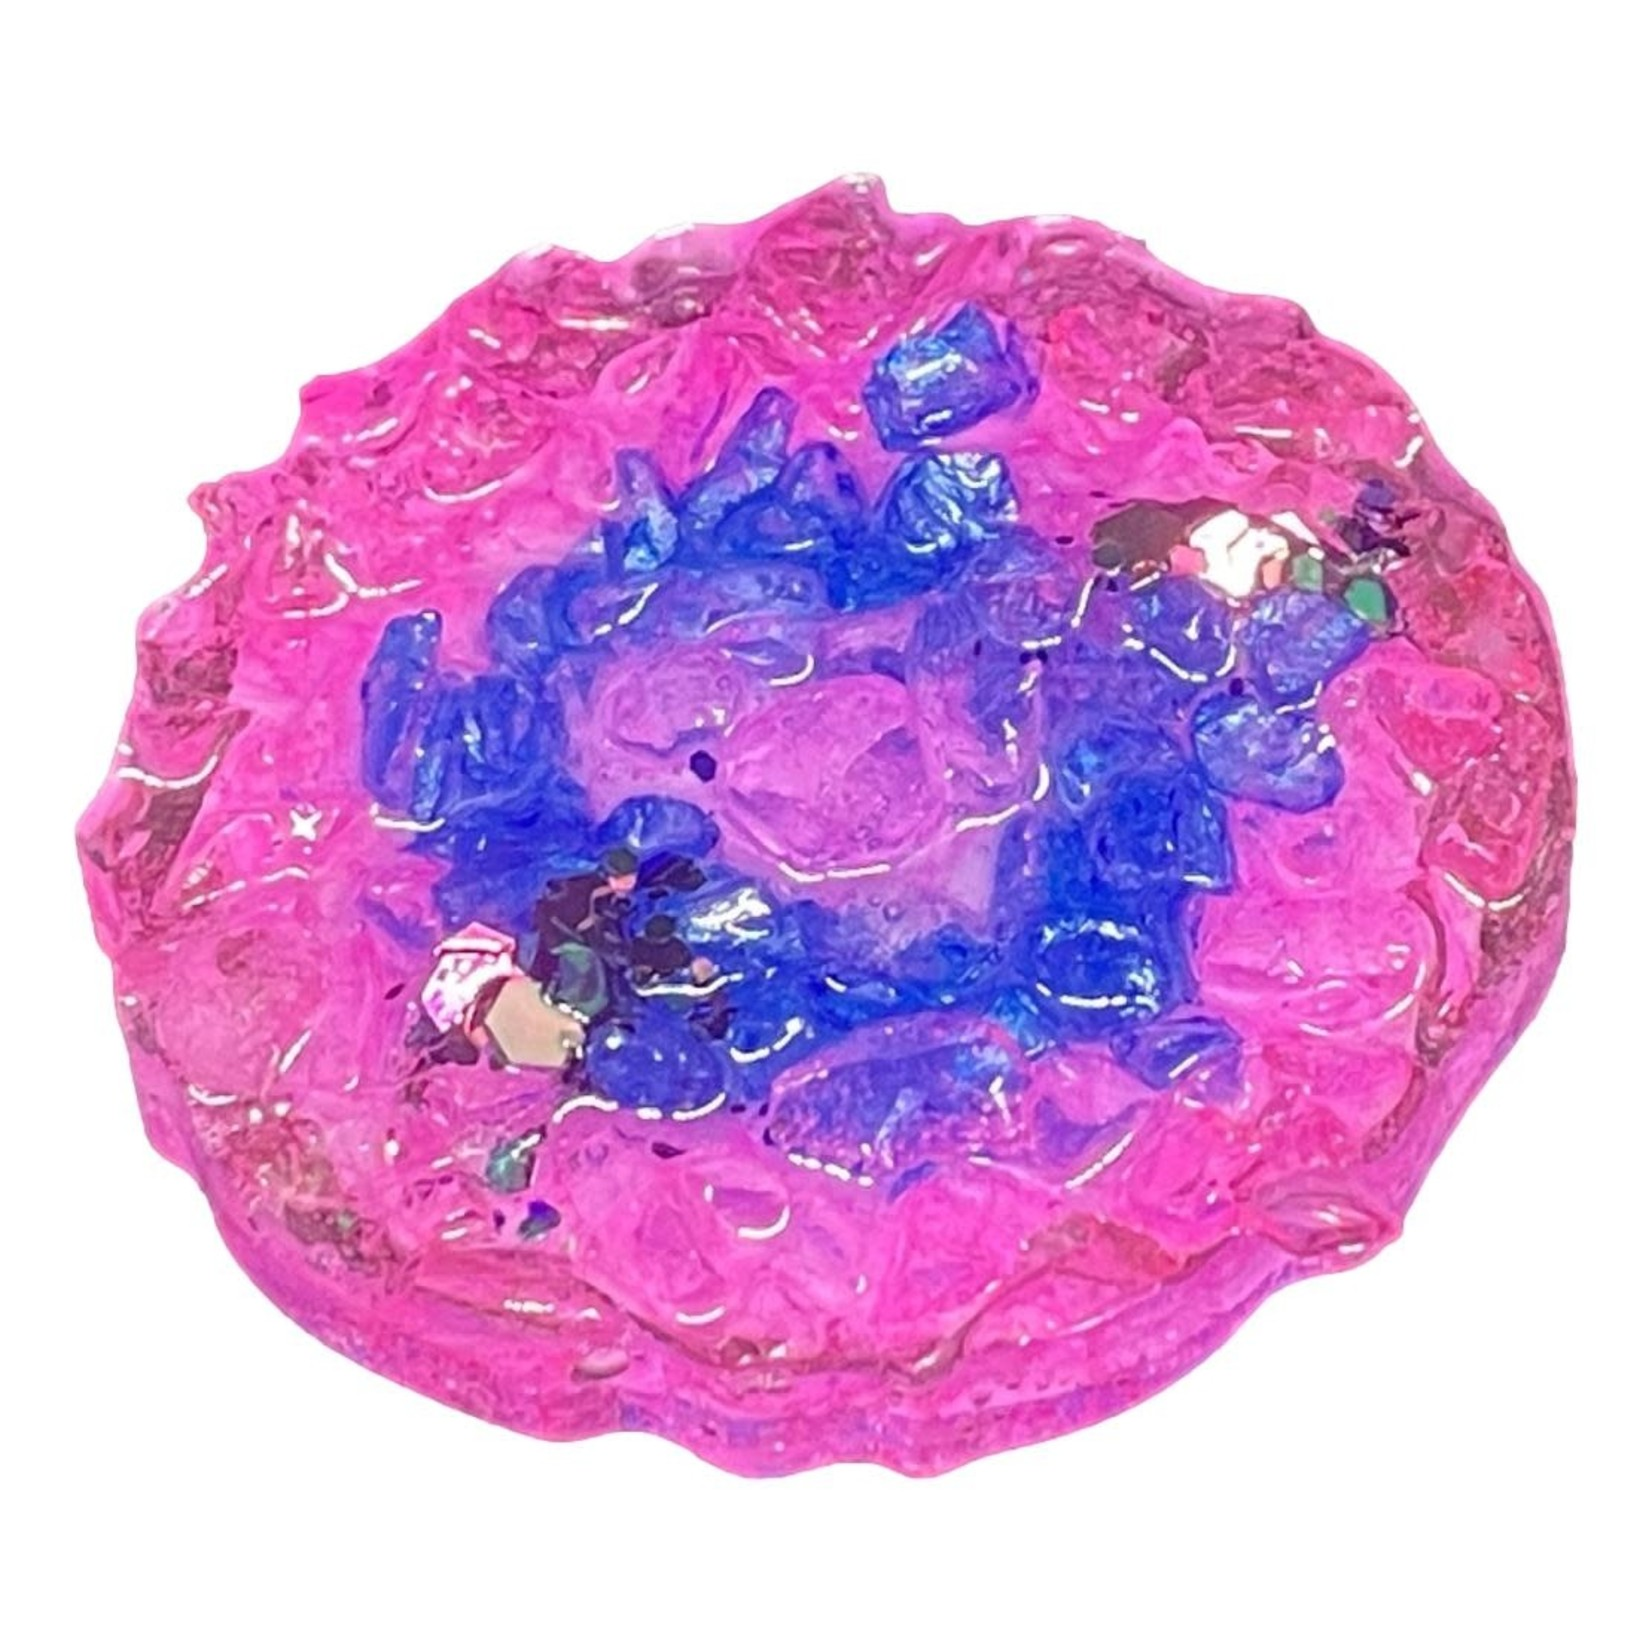 East Coast Sirens Pink & Blue Geode Style Phone Grip